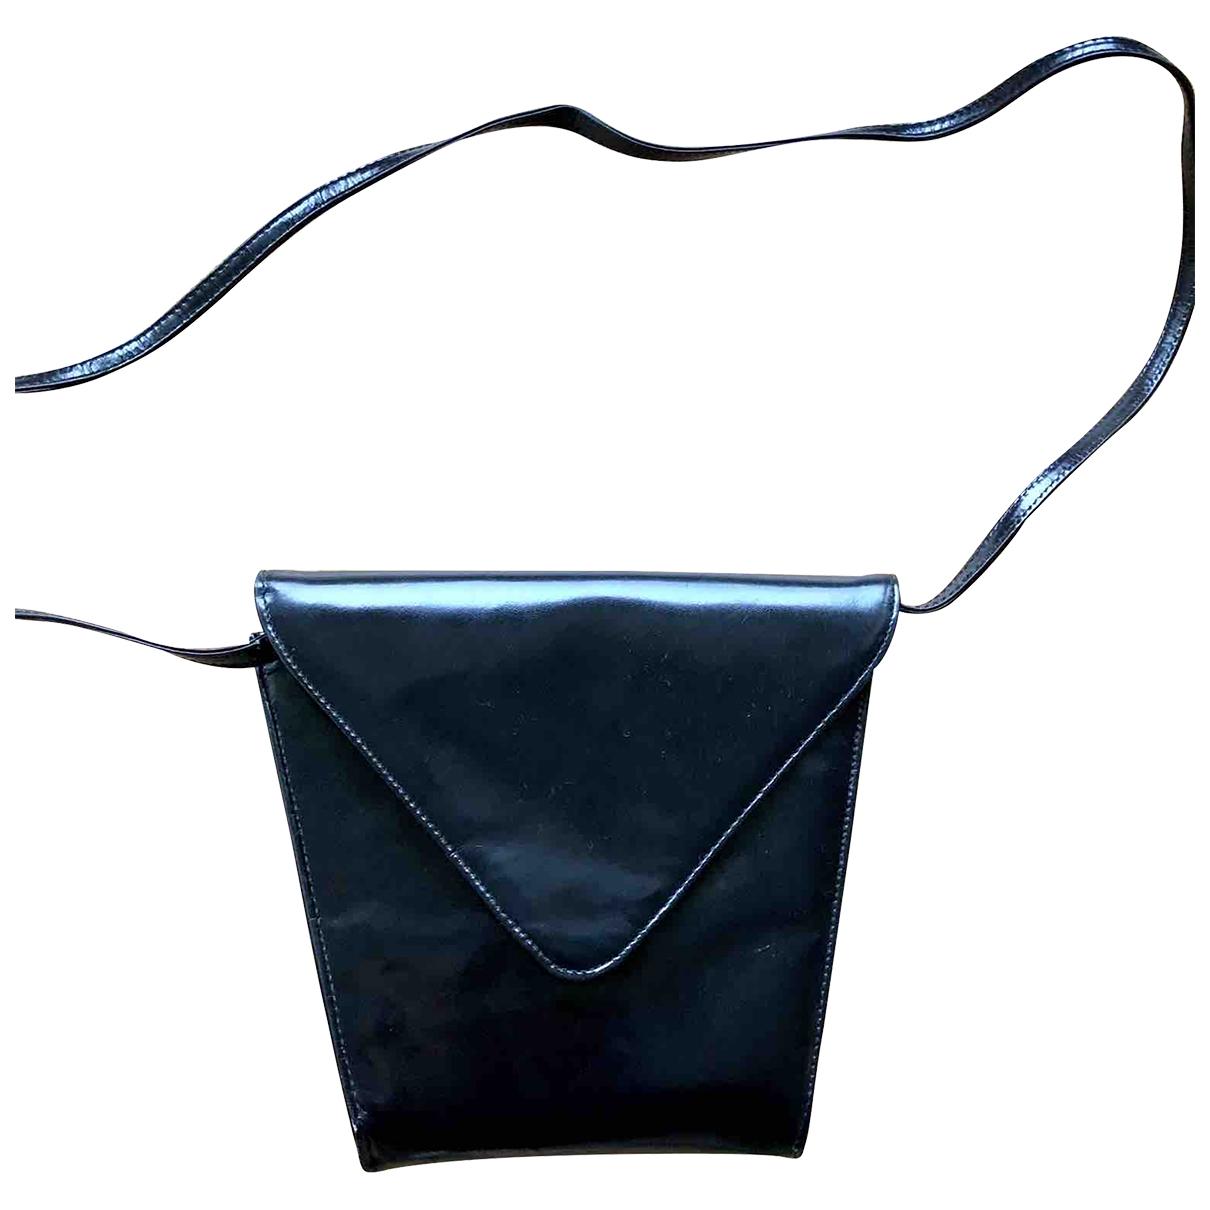 Bally \N Black Leather Clutch bag for Women \N